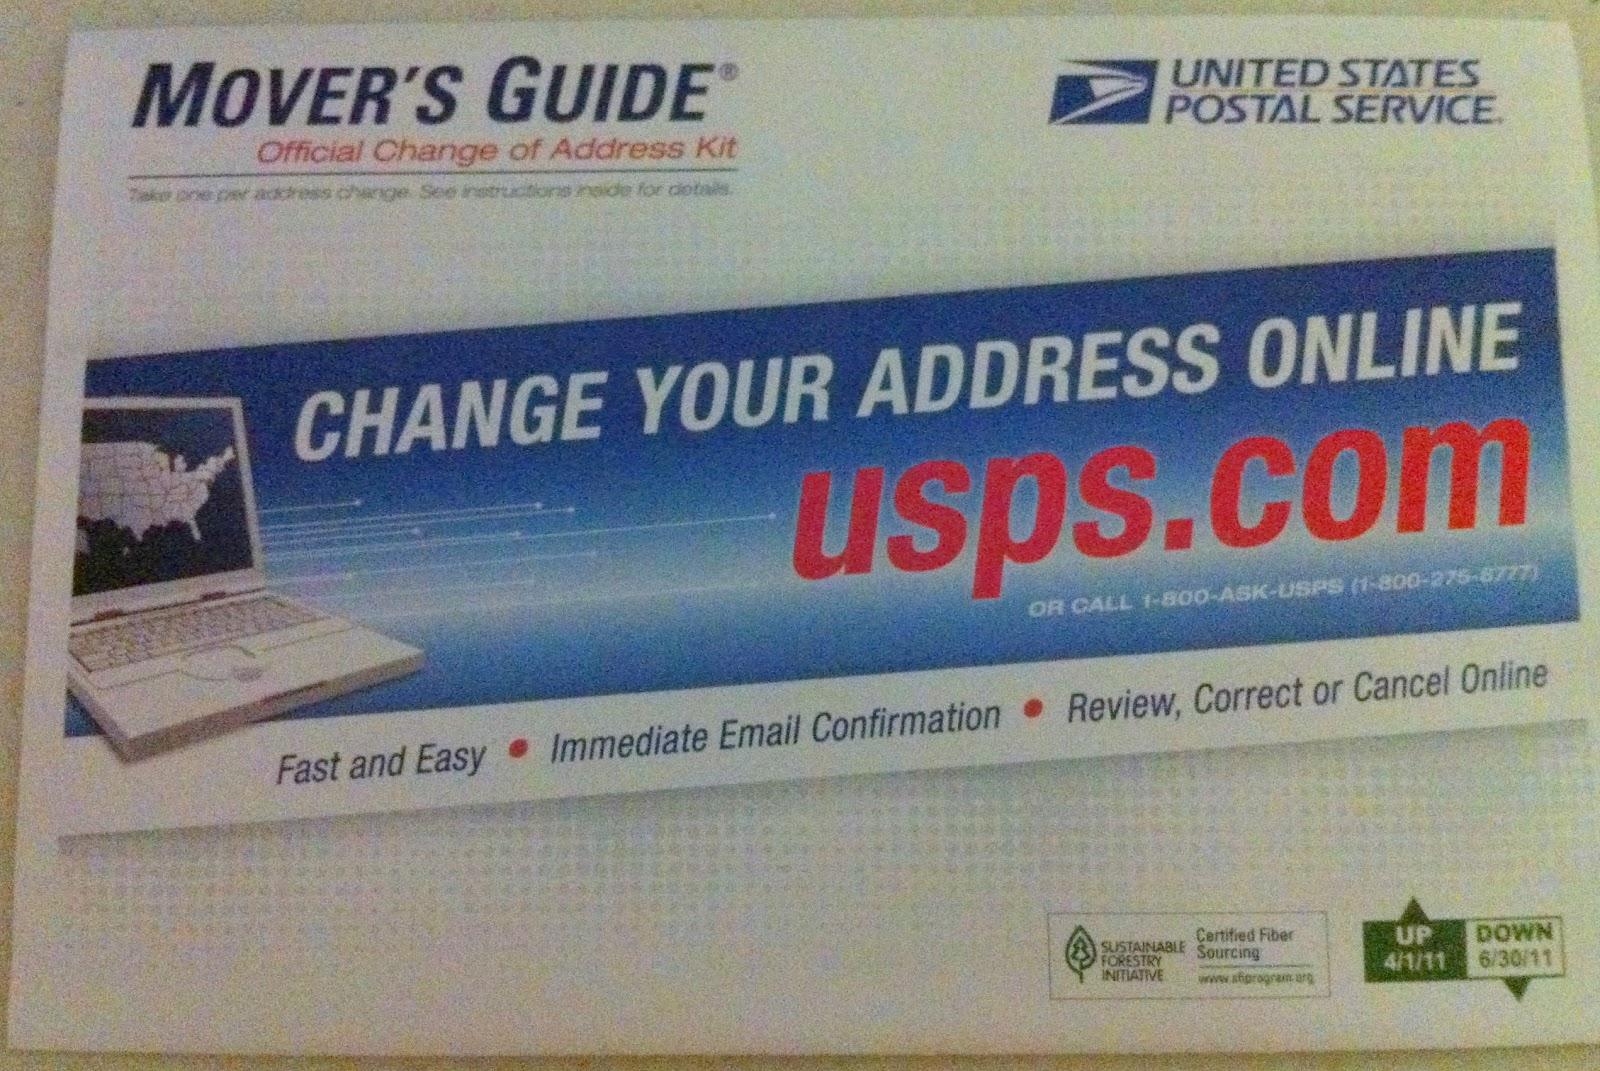 Usps coupon code